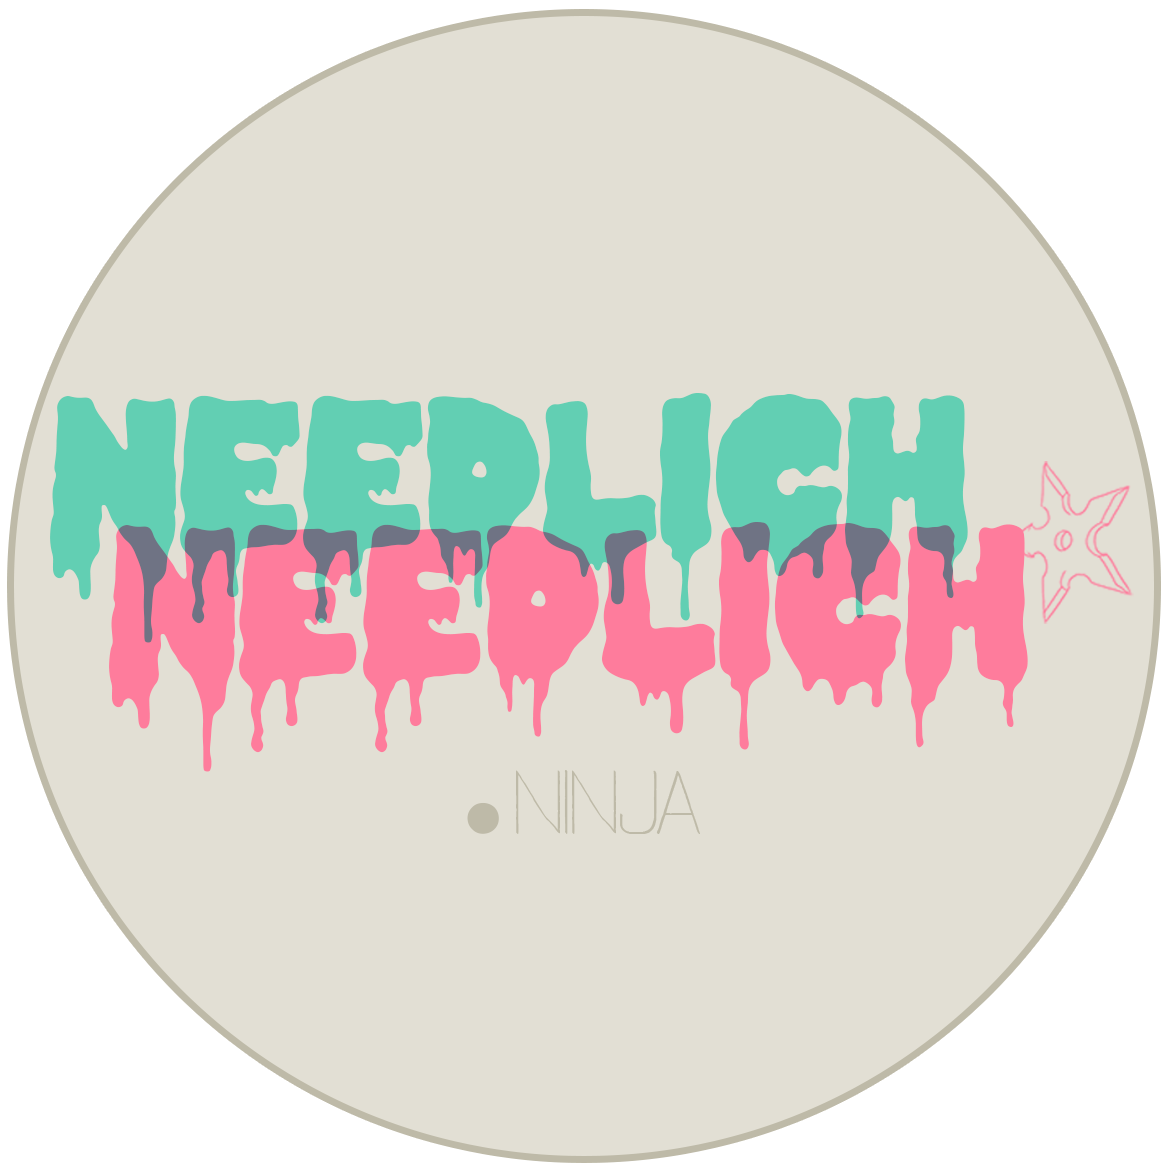 www.needlich.ninja